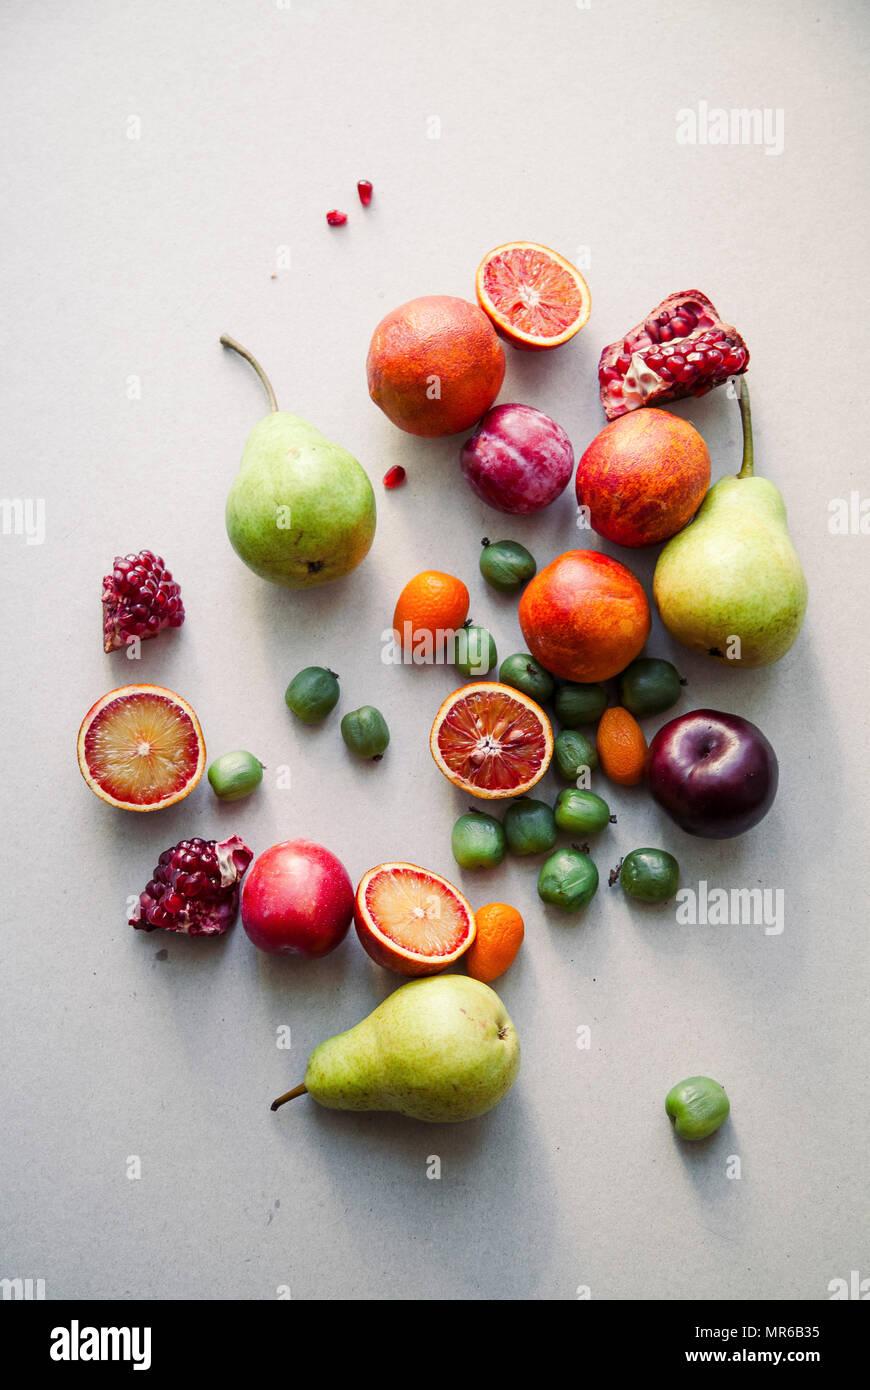 Varitety of fresh summer fruits on neutral background - Stock Image